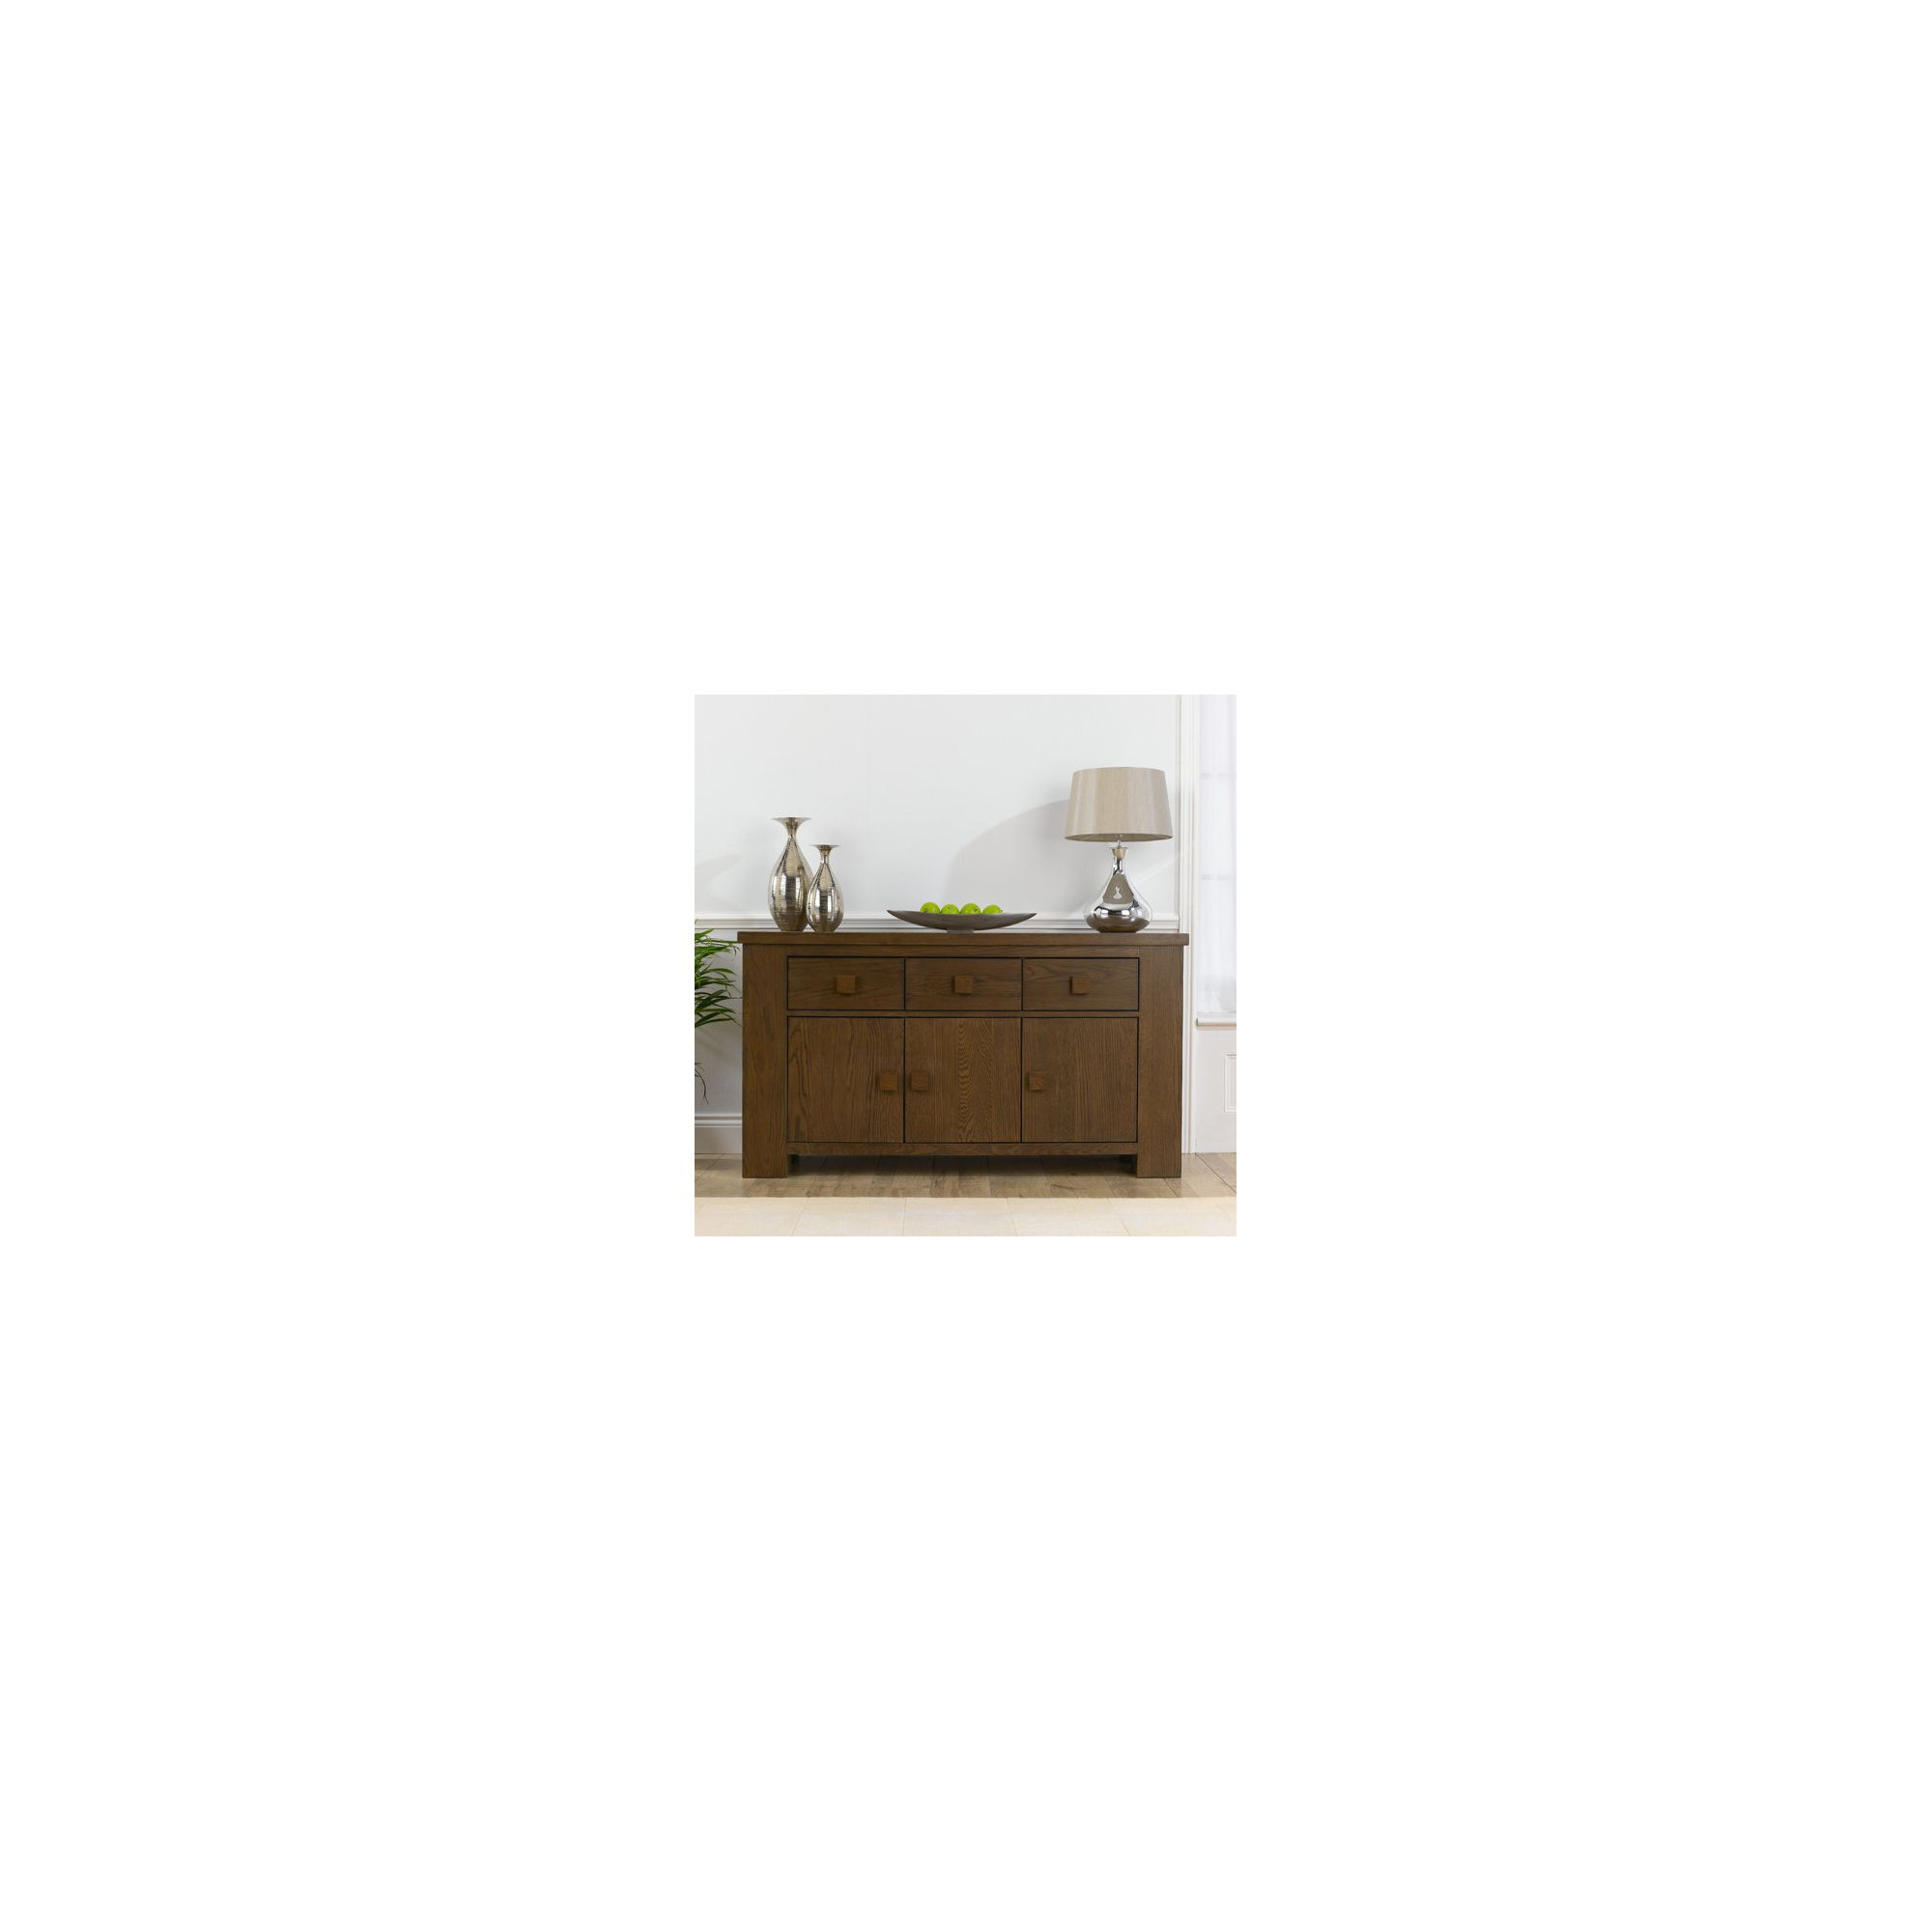 Mark Harris Furniture Barcelona Oak Sideboard - Large at Tescos Direct